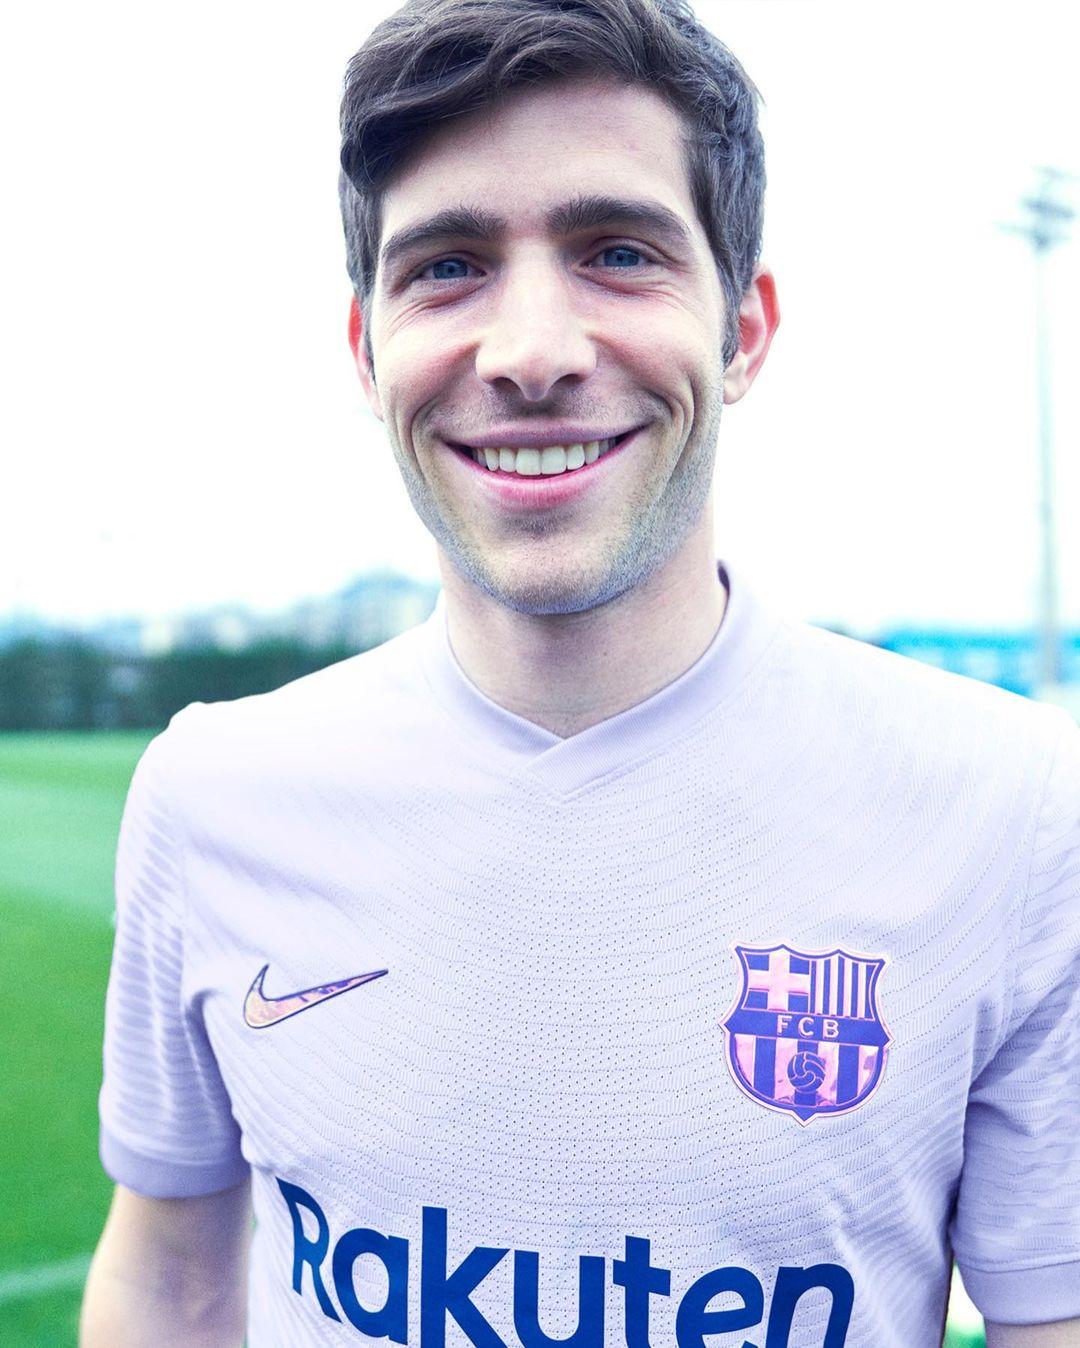 FC Barcelone 2022 maillot exterieur foot violet